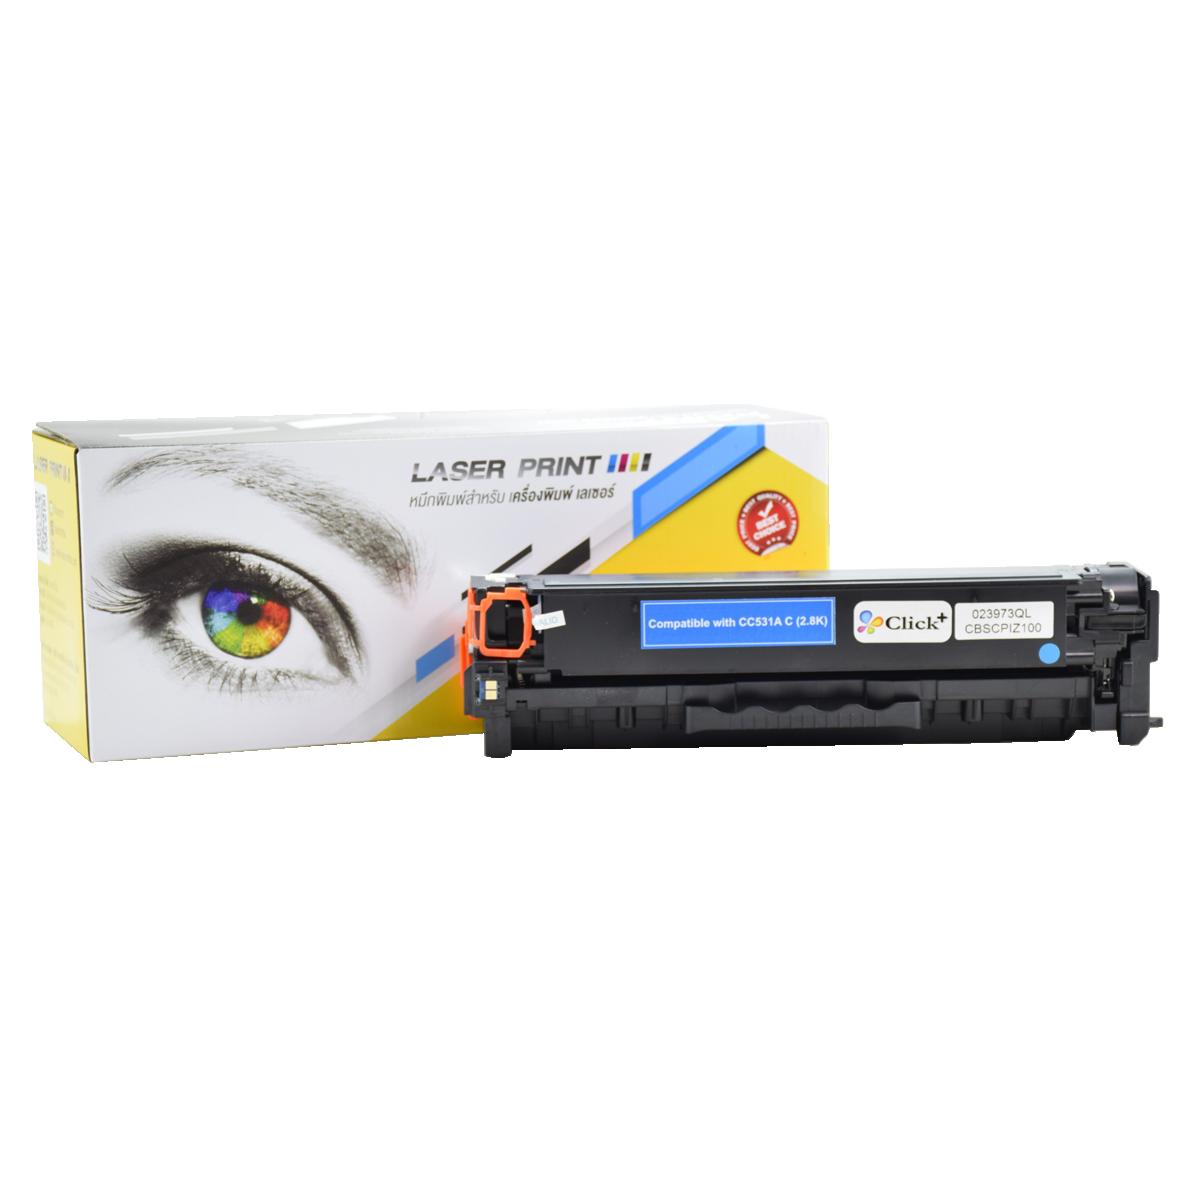 CC531A (HP 304A) /Canon Cartridge 318/418C 2.8k Laserprint Blue